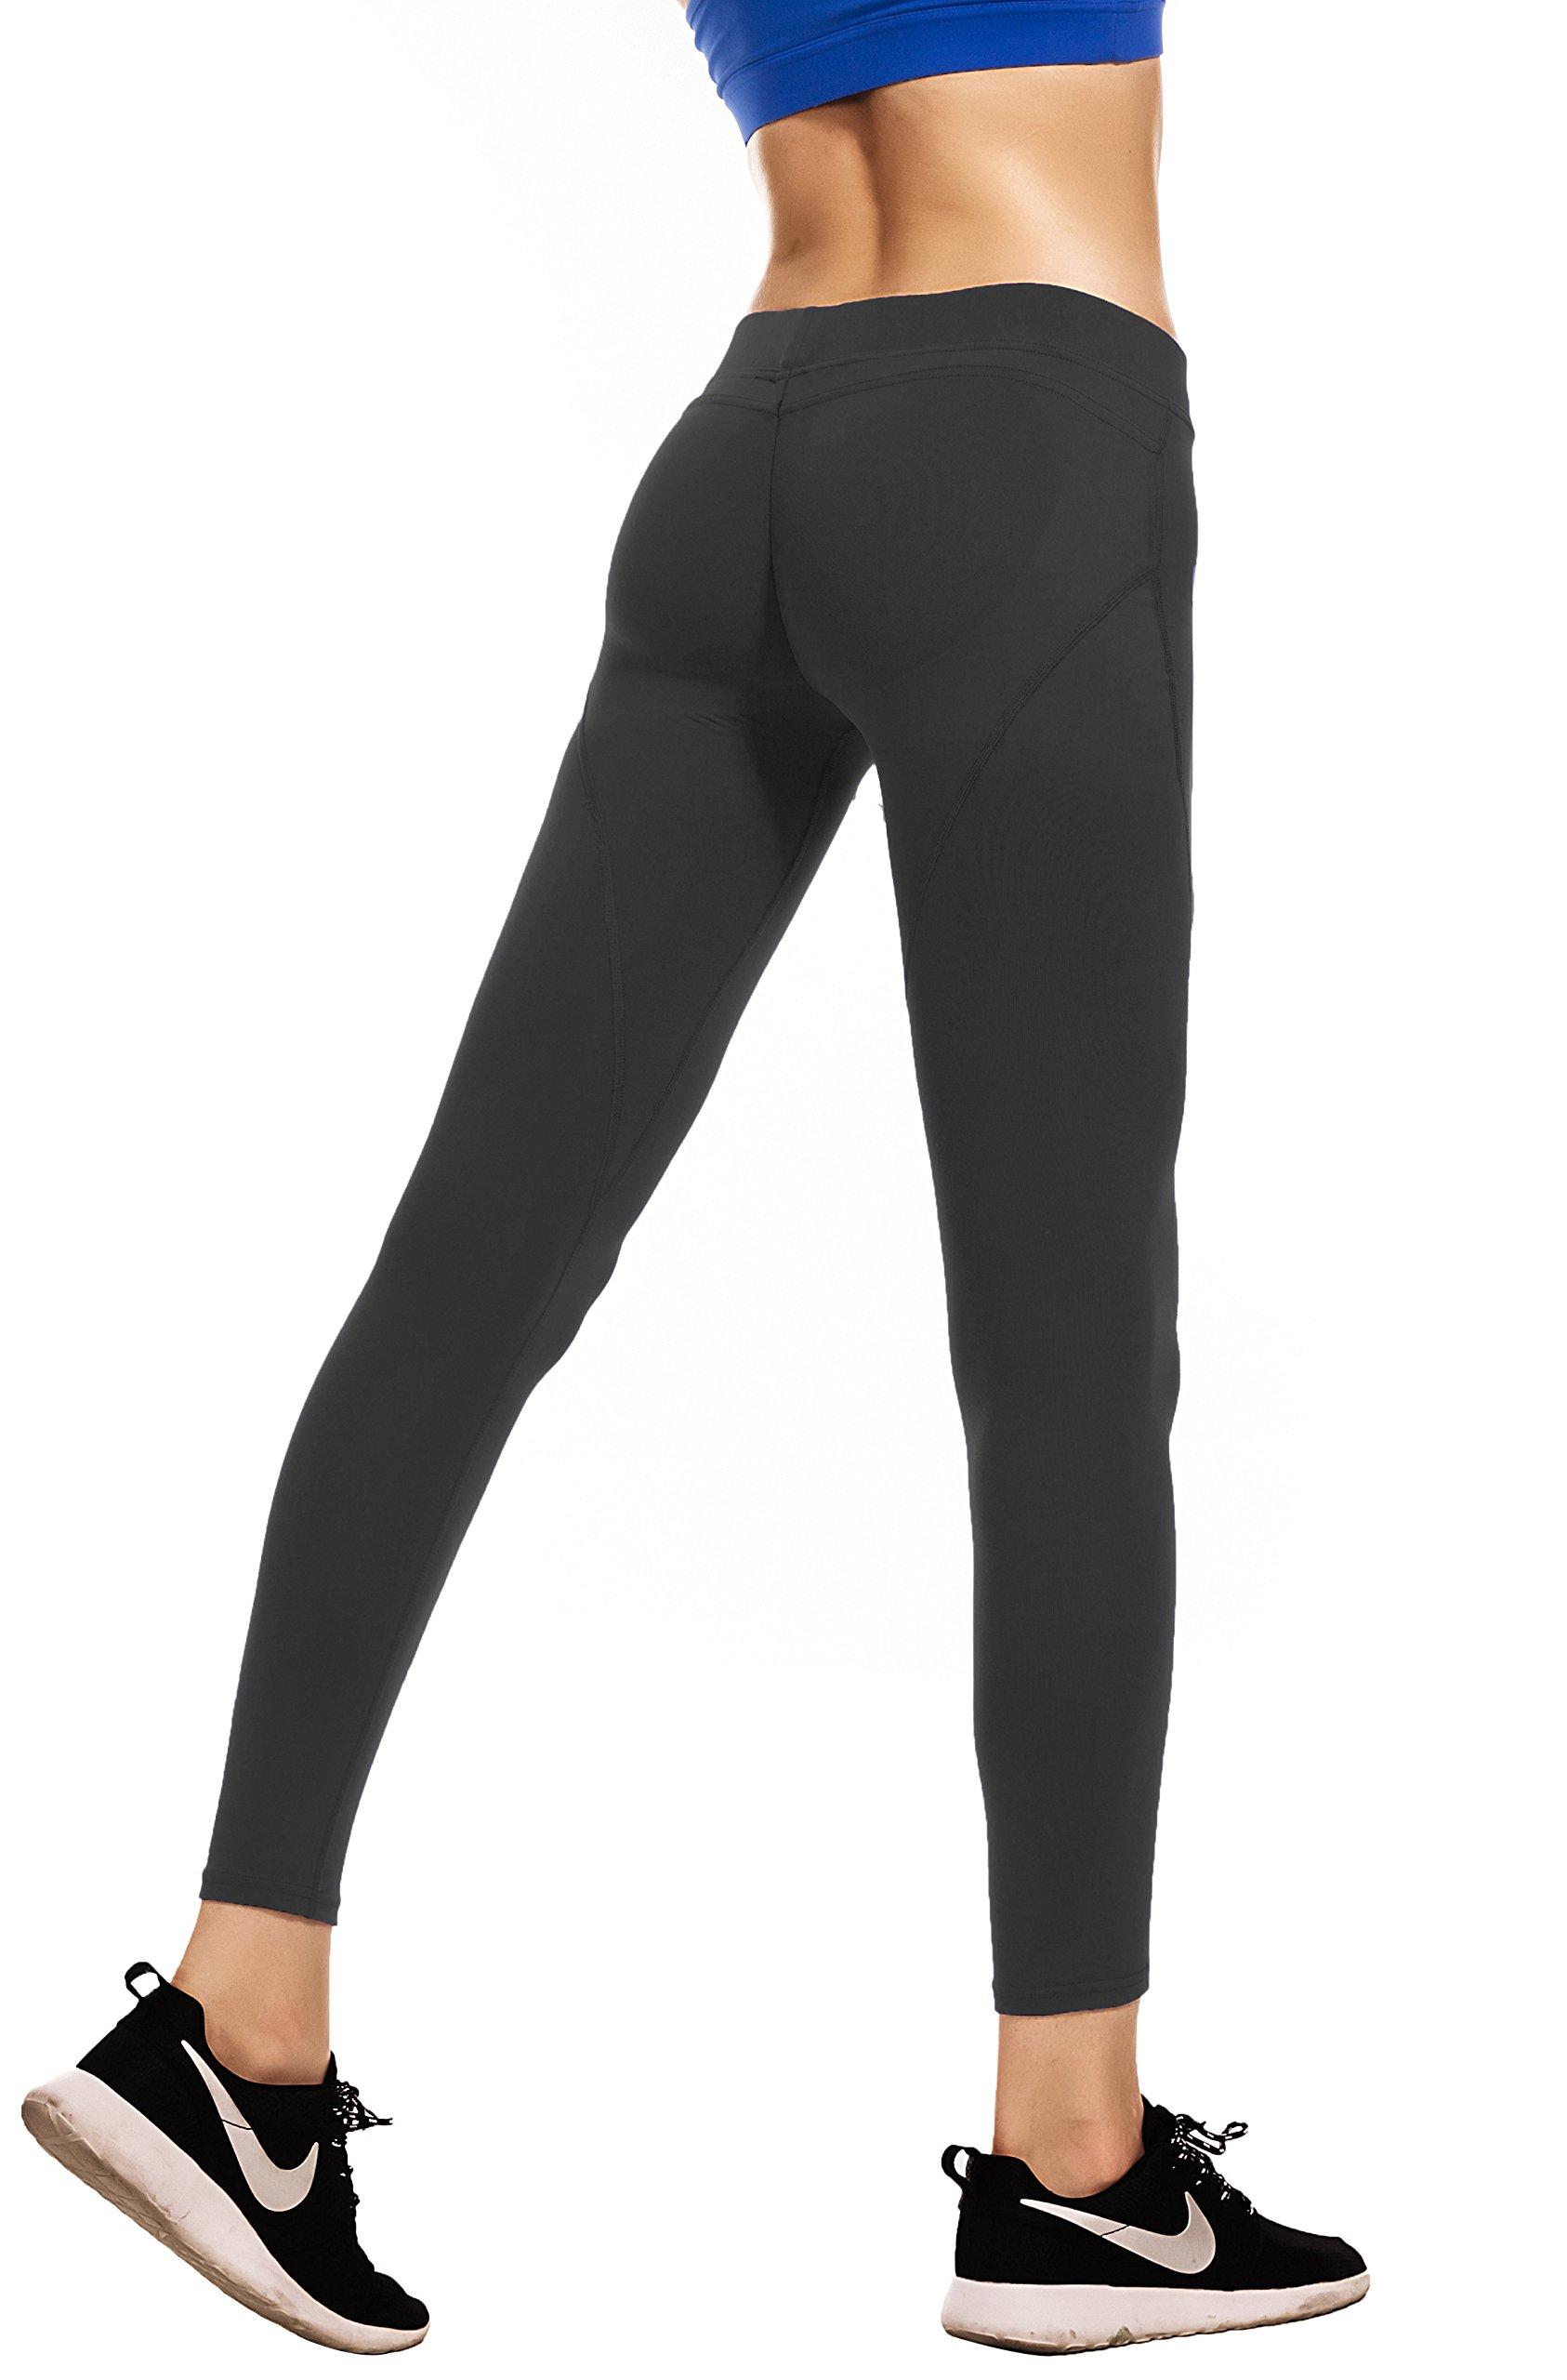 Greatest RUNNING GIRL Sexy Butt Lift Push Up Leggings Yoga Pants Shapewear  QU73